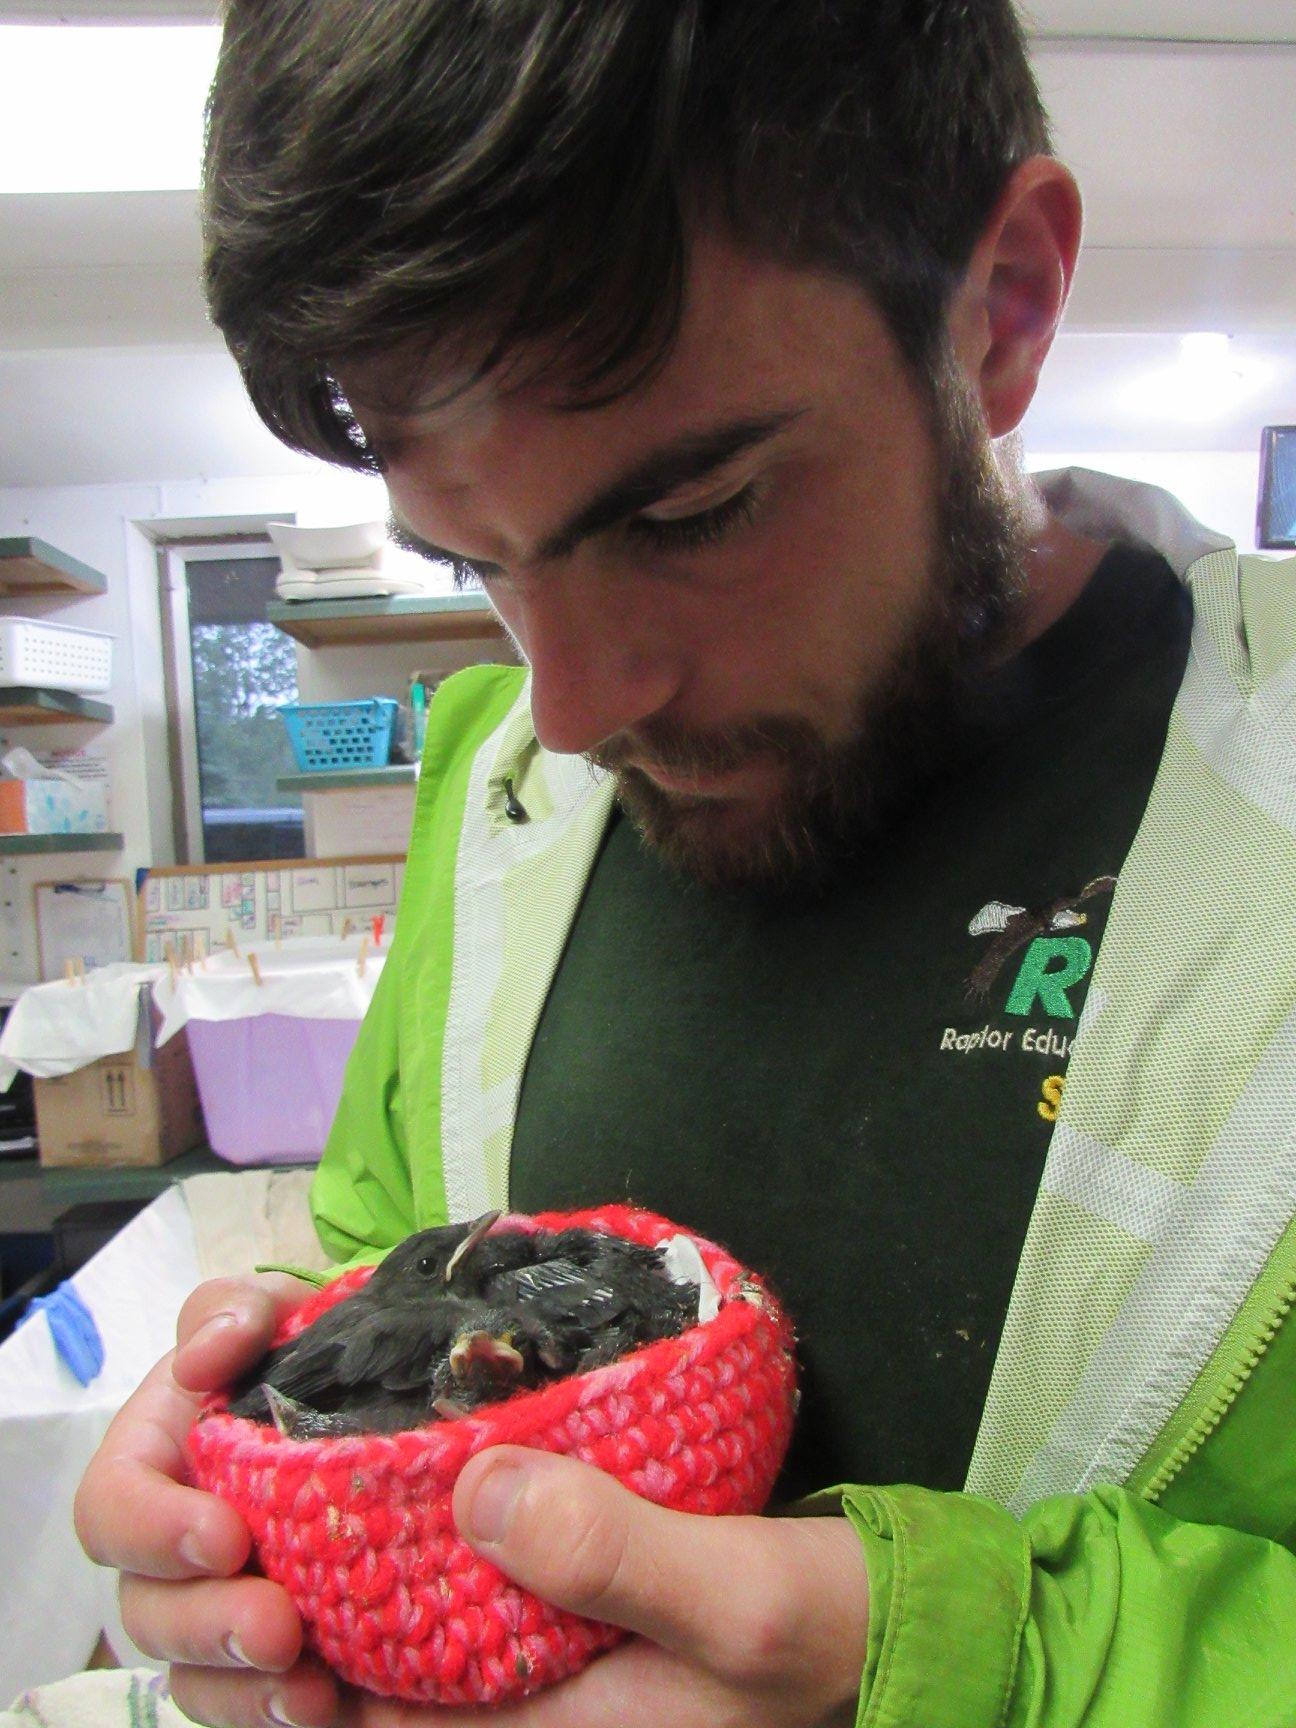 Baby Catbirds are adorable! Christopher Ryan Pavlakovich intern from Humboldt State University, Arcata, CA